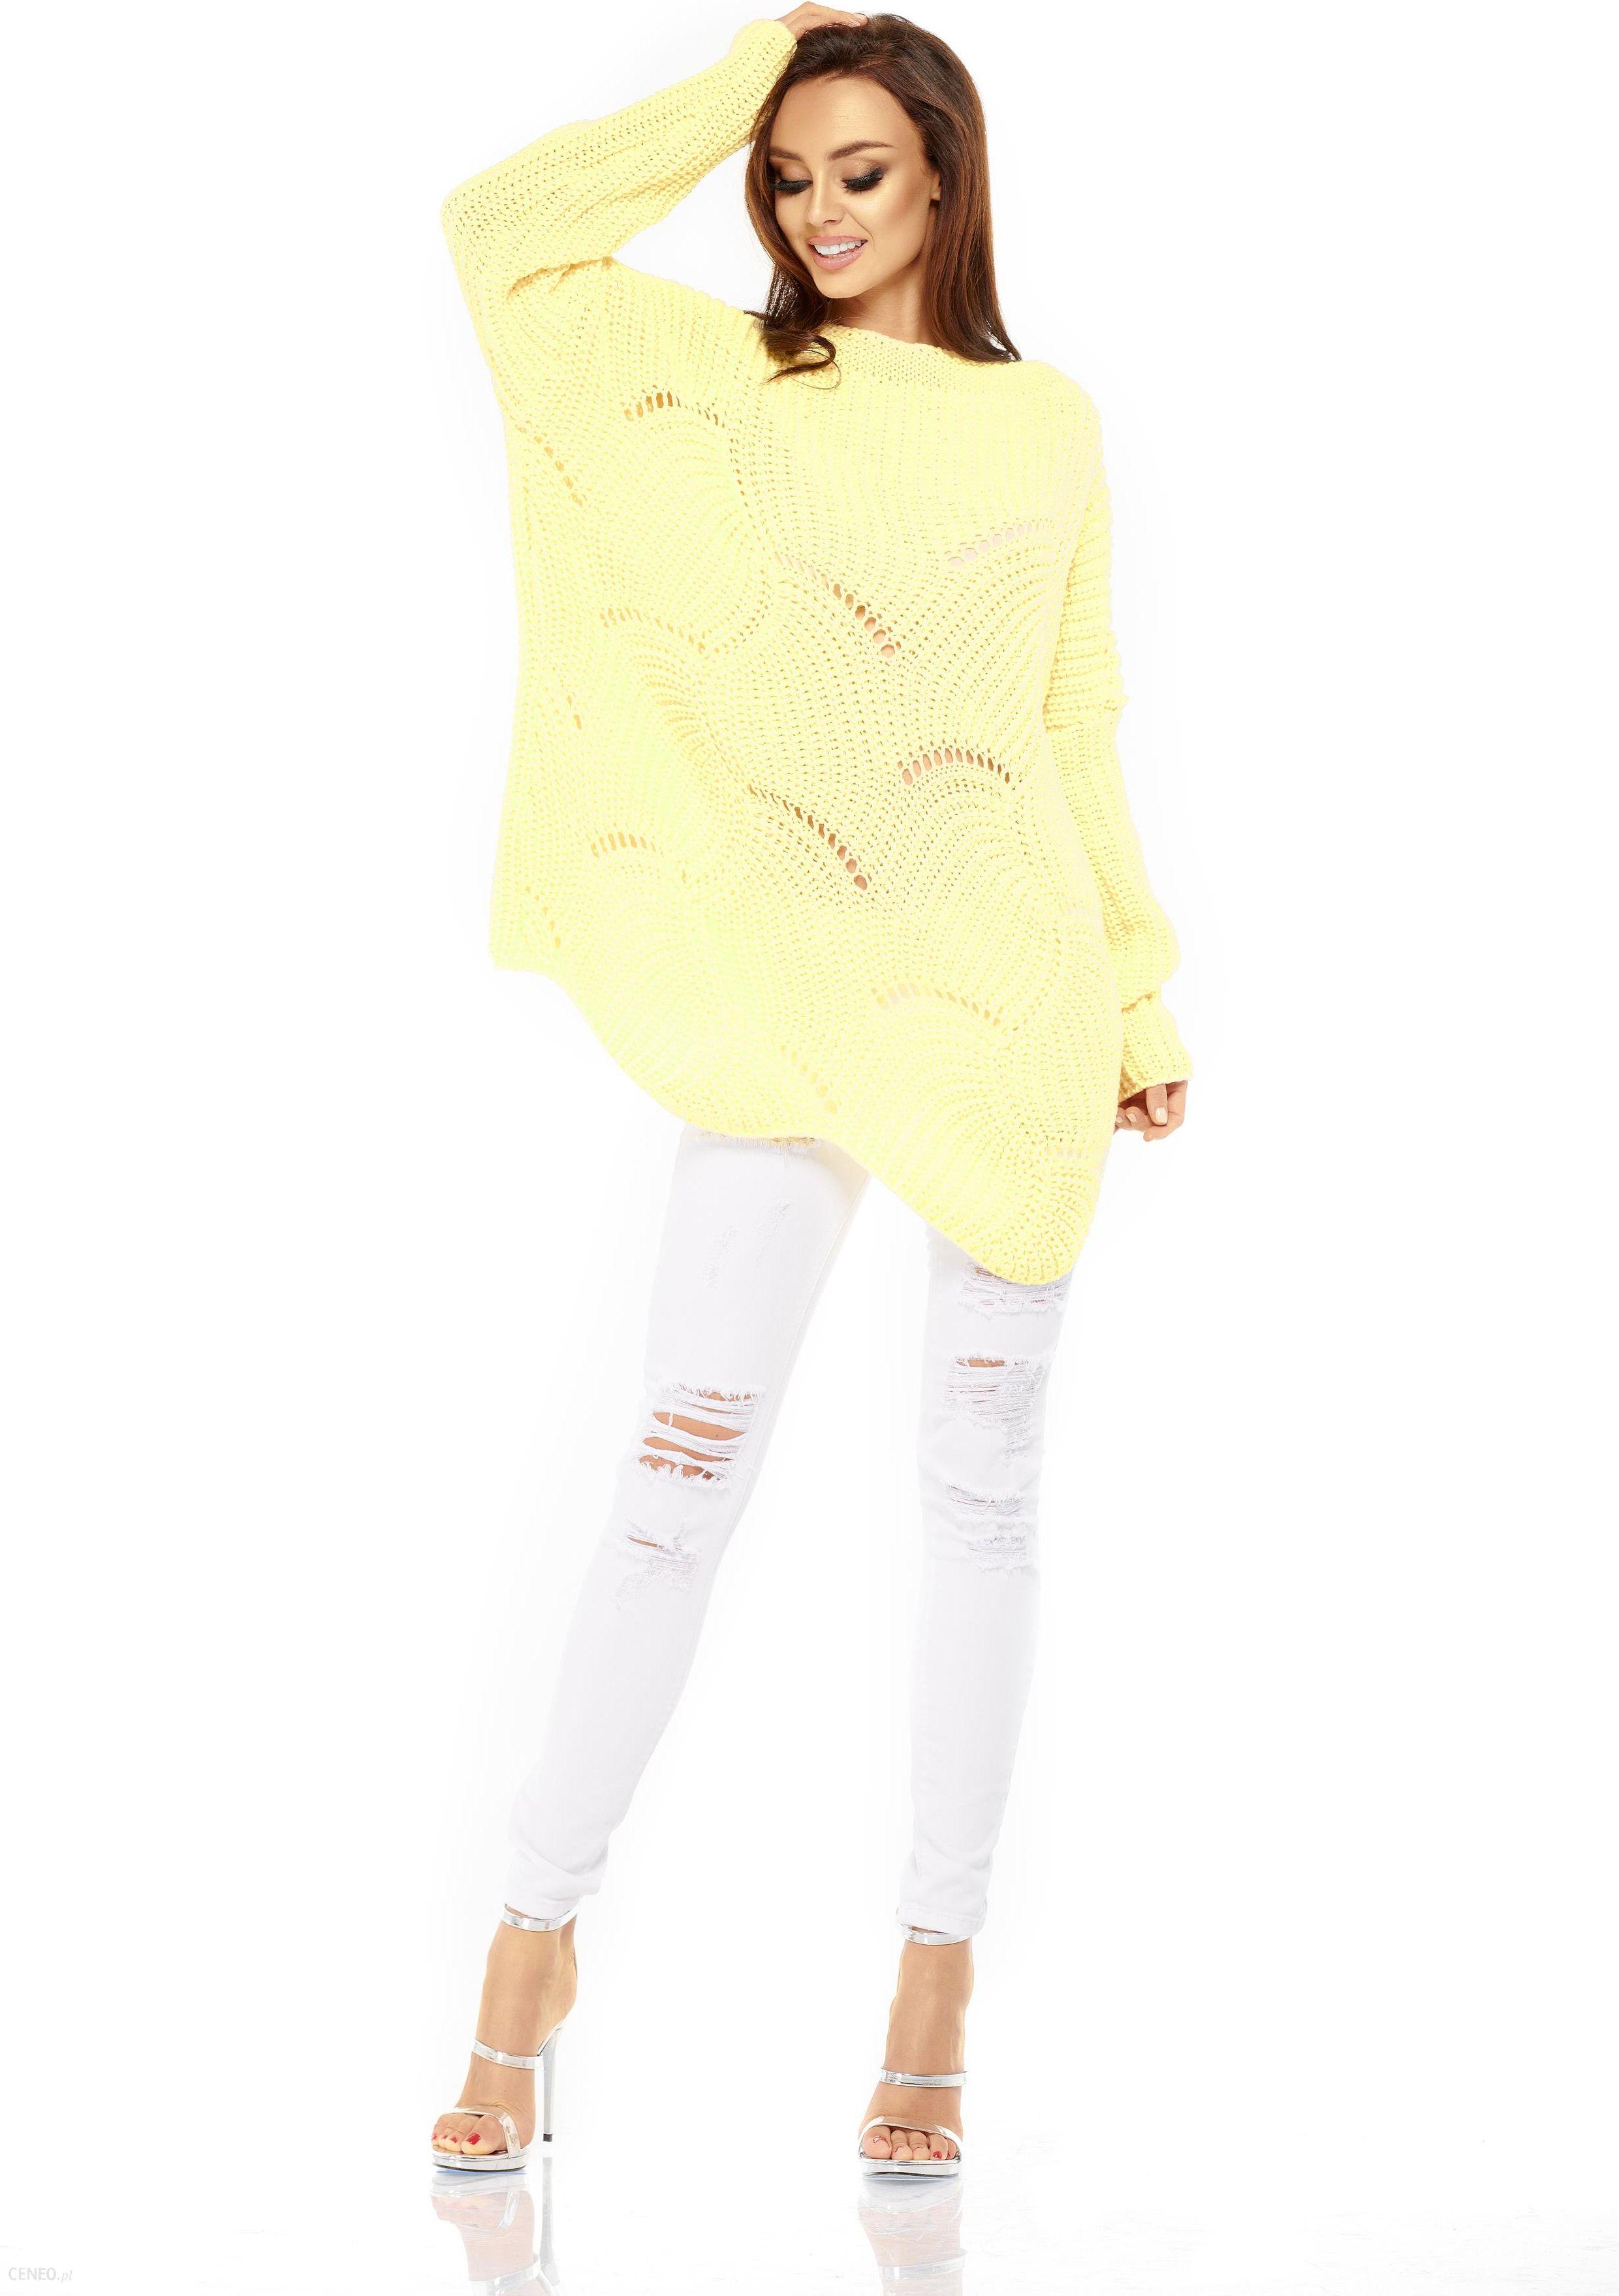 5e82f19d6b24f2 Lemoniade LEMONIADE LS209 Luźny sweter oversize Żółty - Ceny i ...